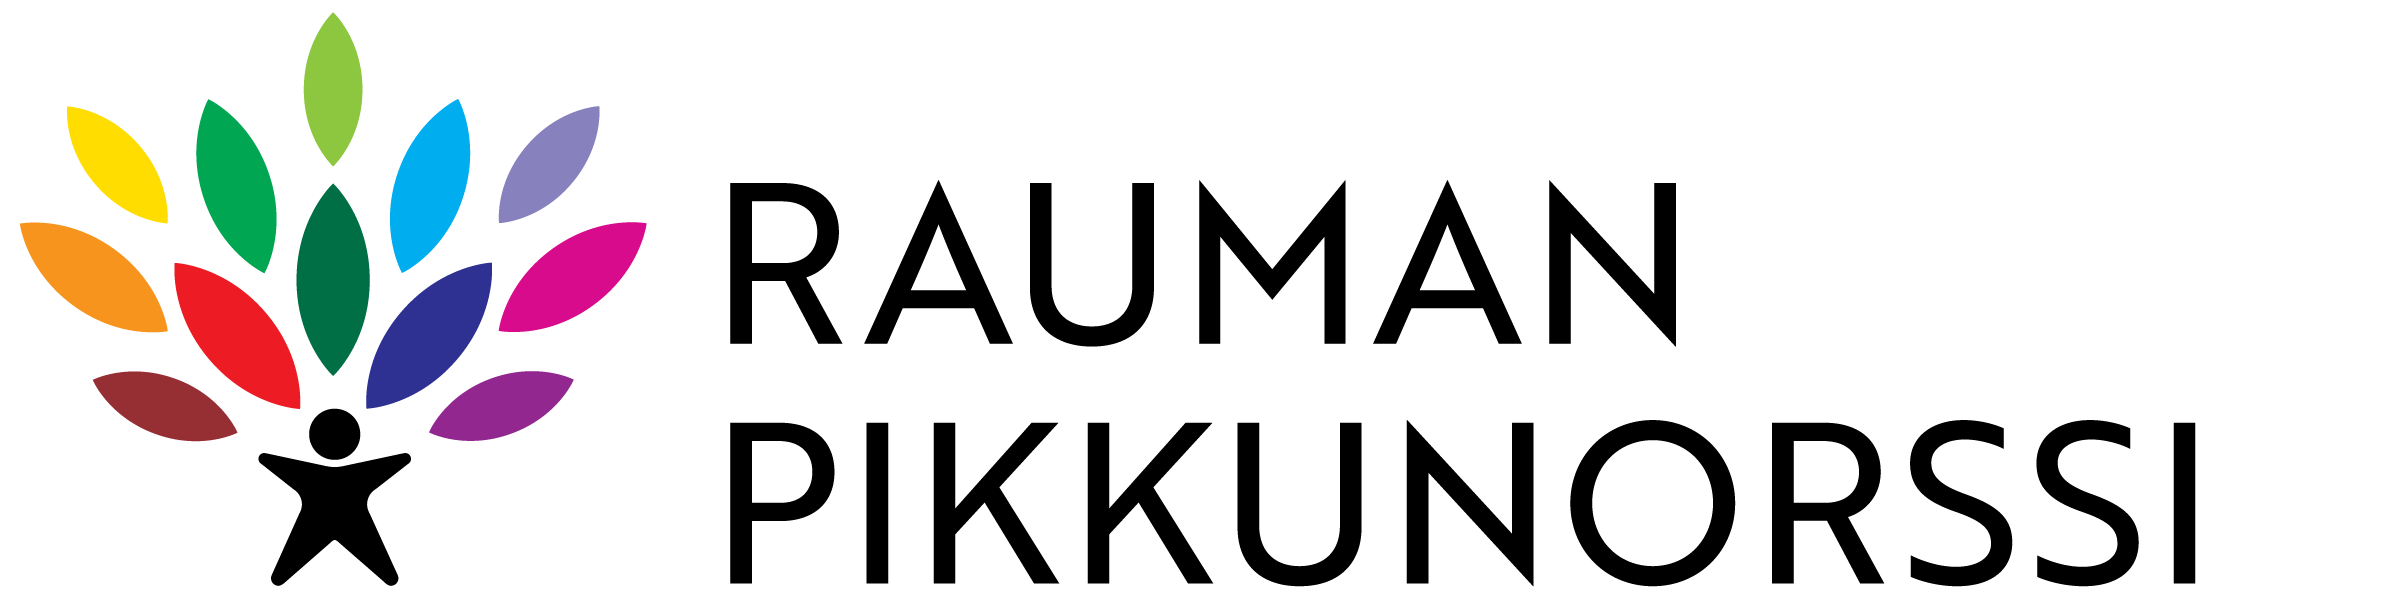 Rauman pikkunorssi